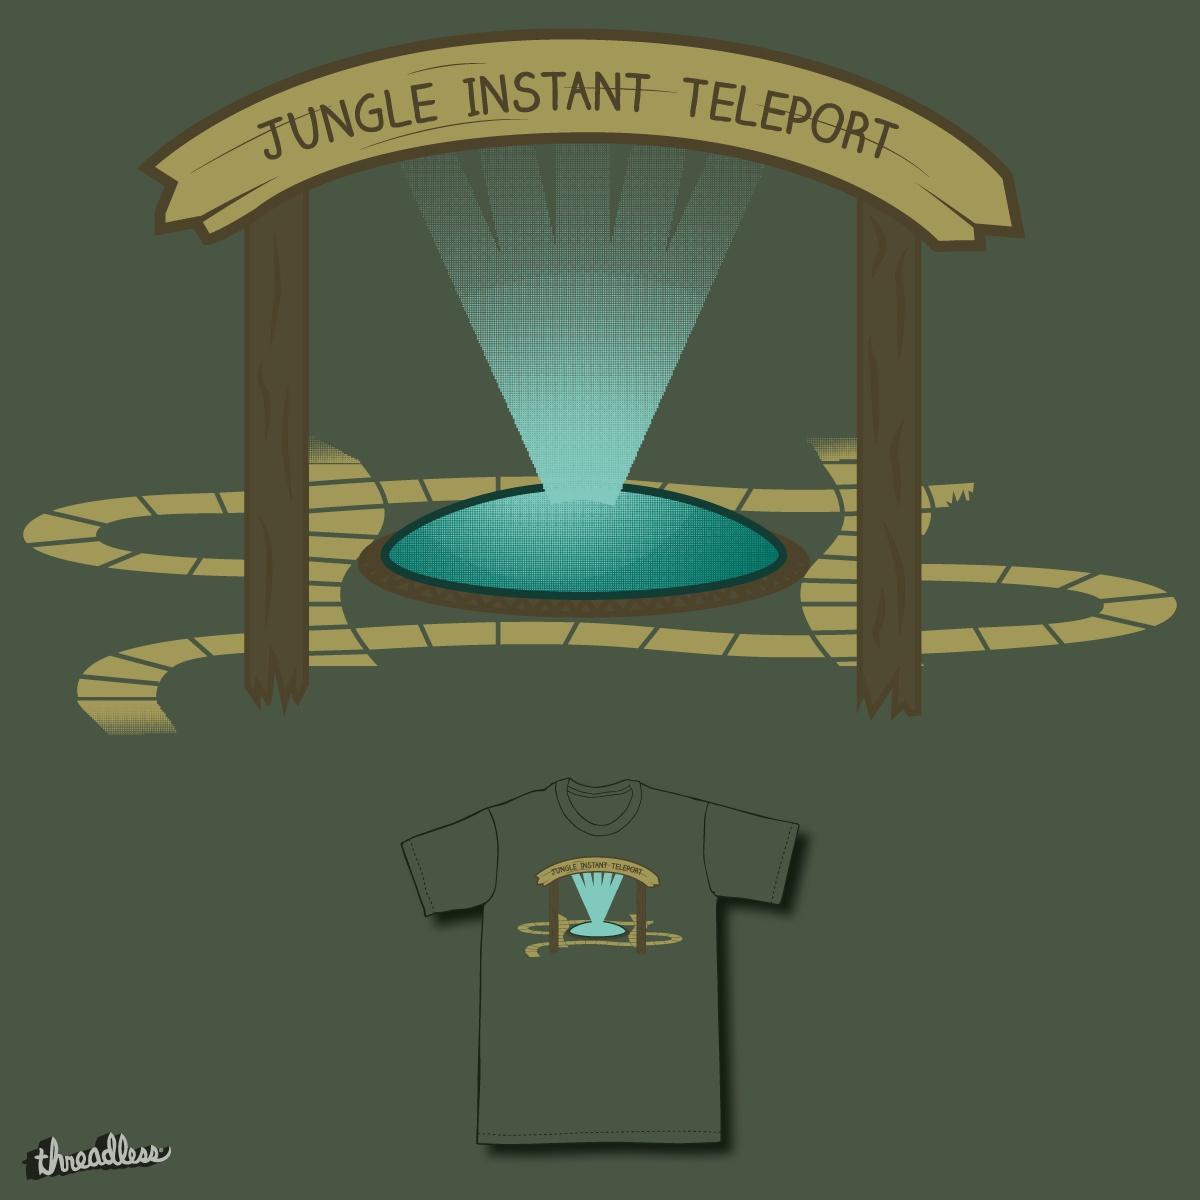 Jungle instant teleport by ntesign on Threadless